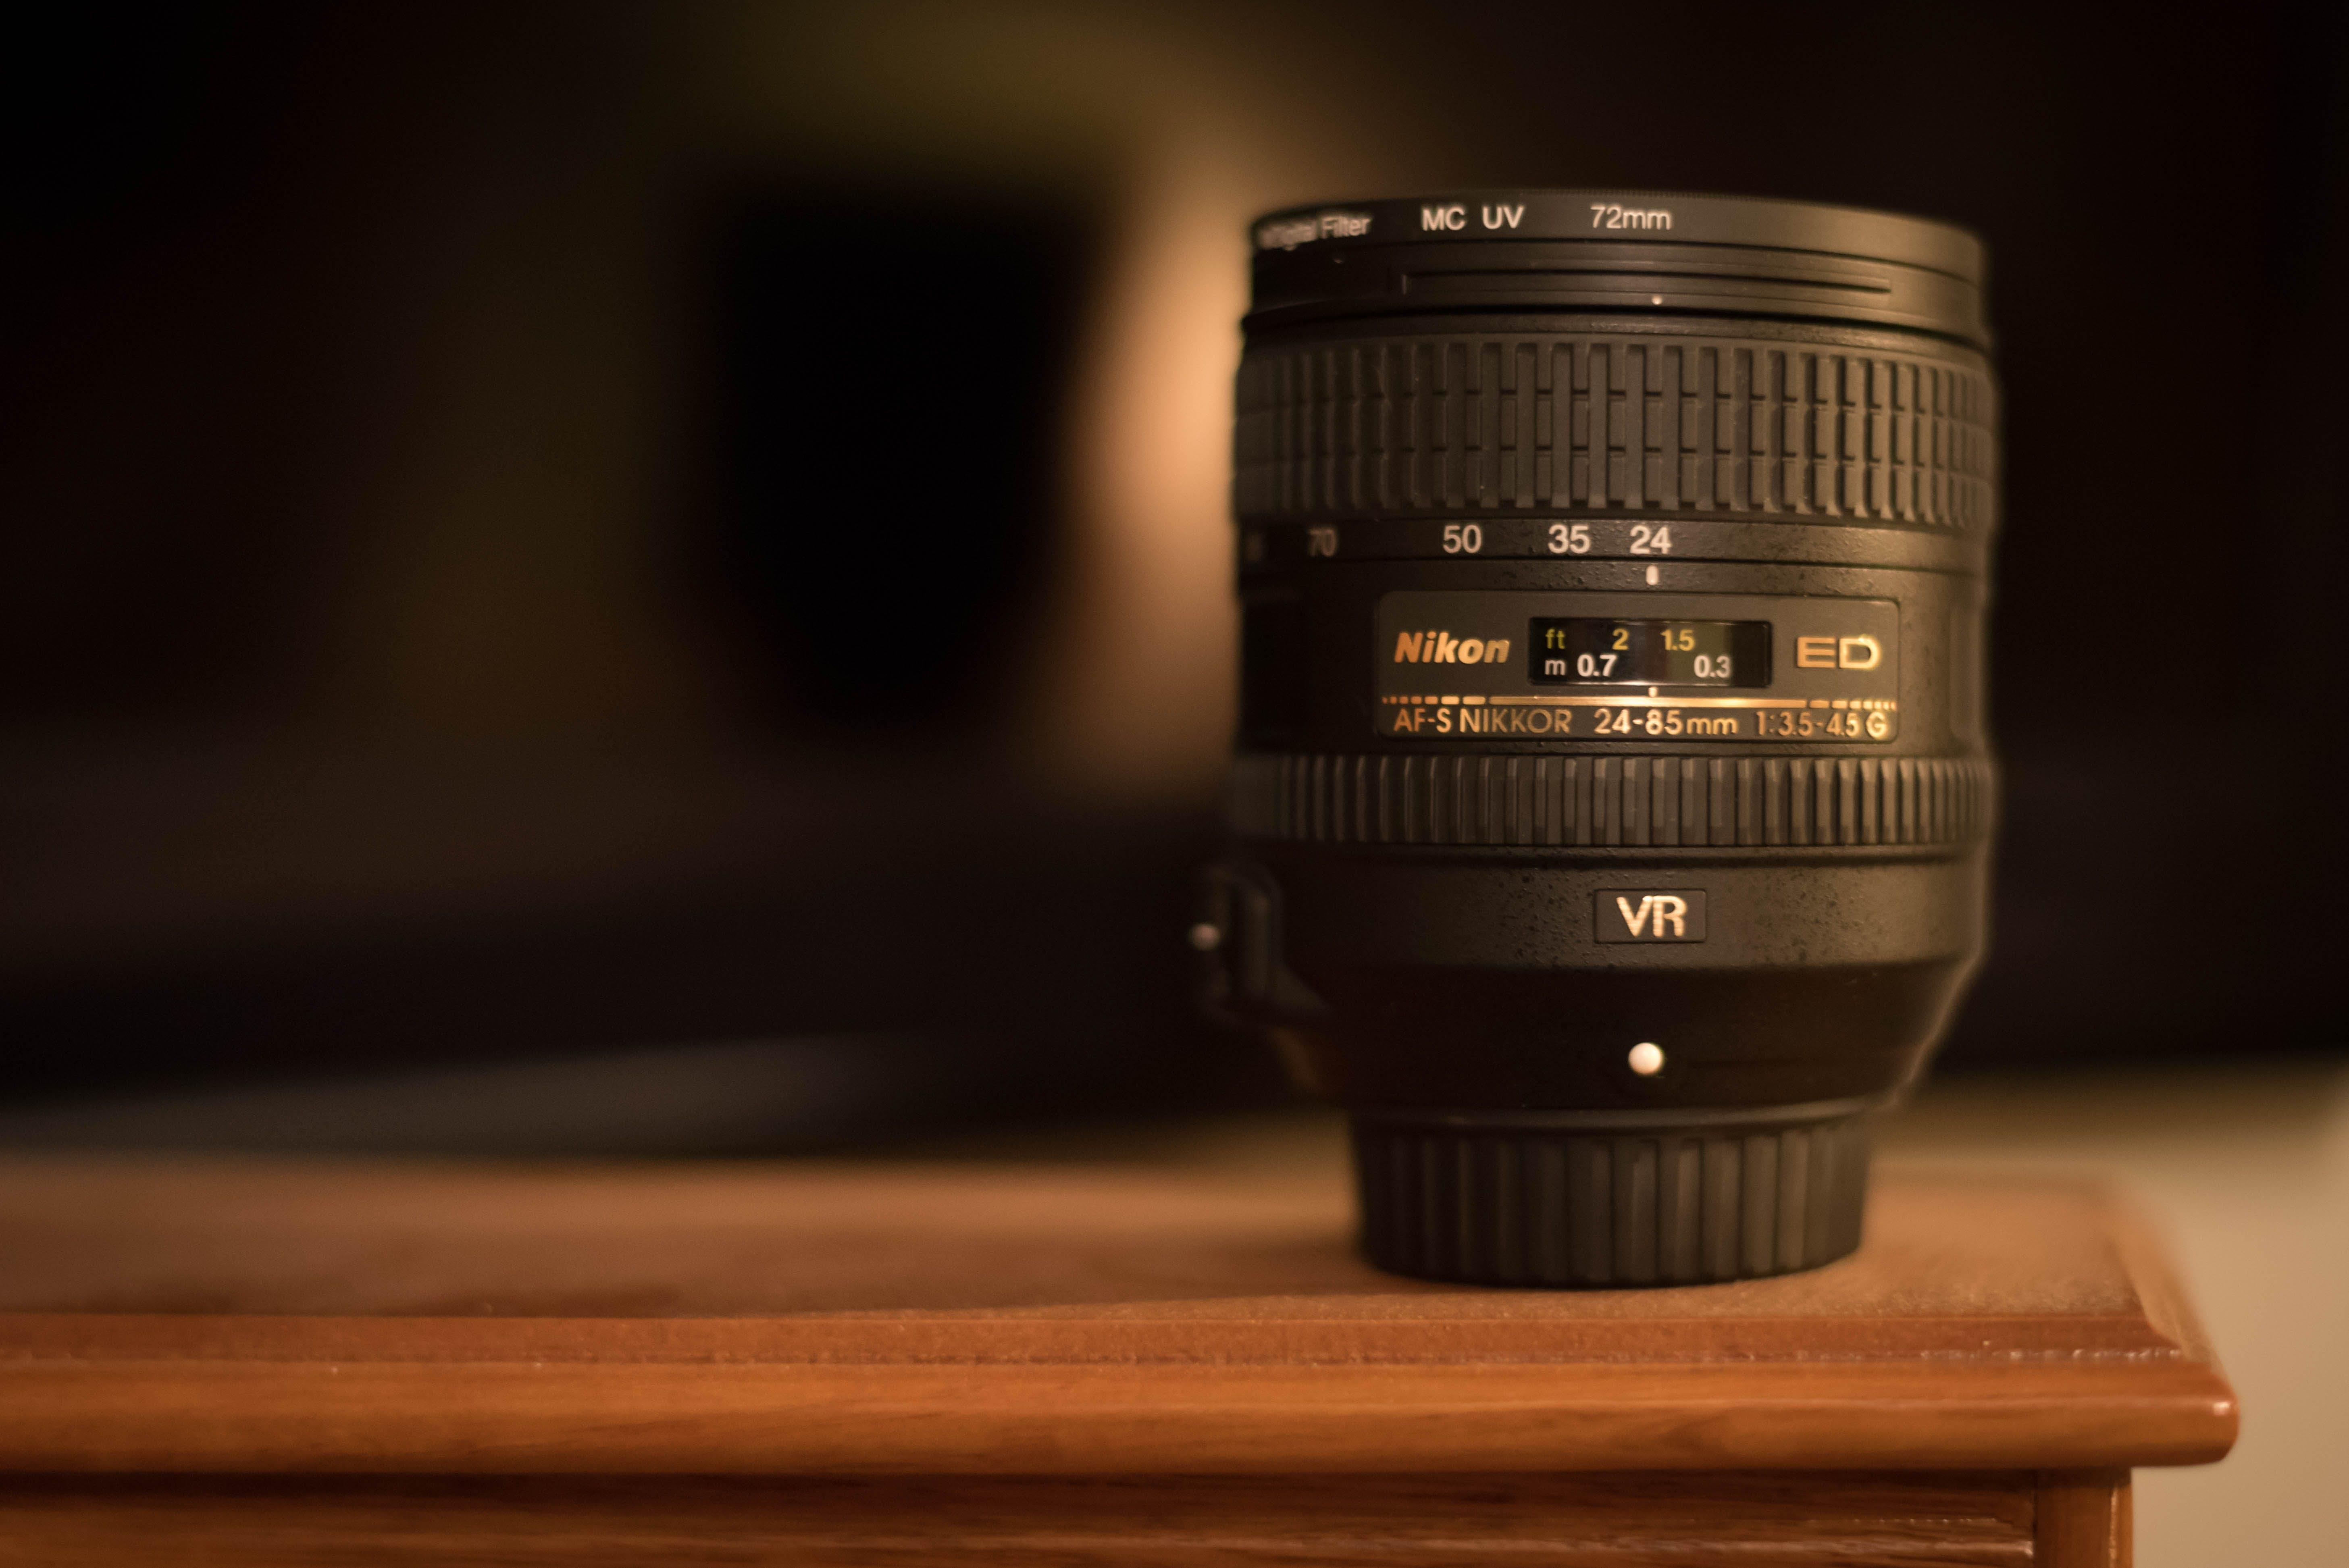 Black Nikon Dslr Camera Lens on Brown Surface